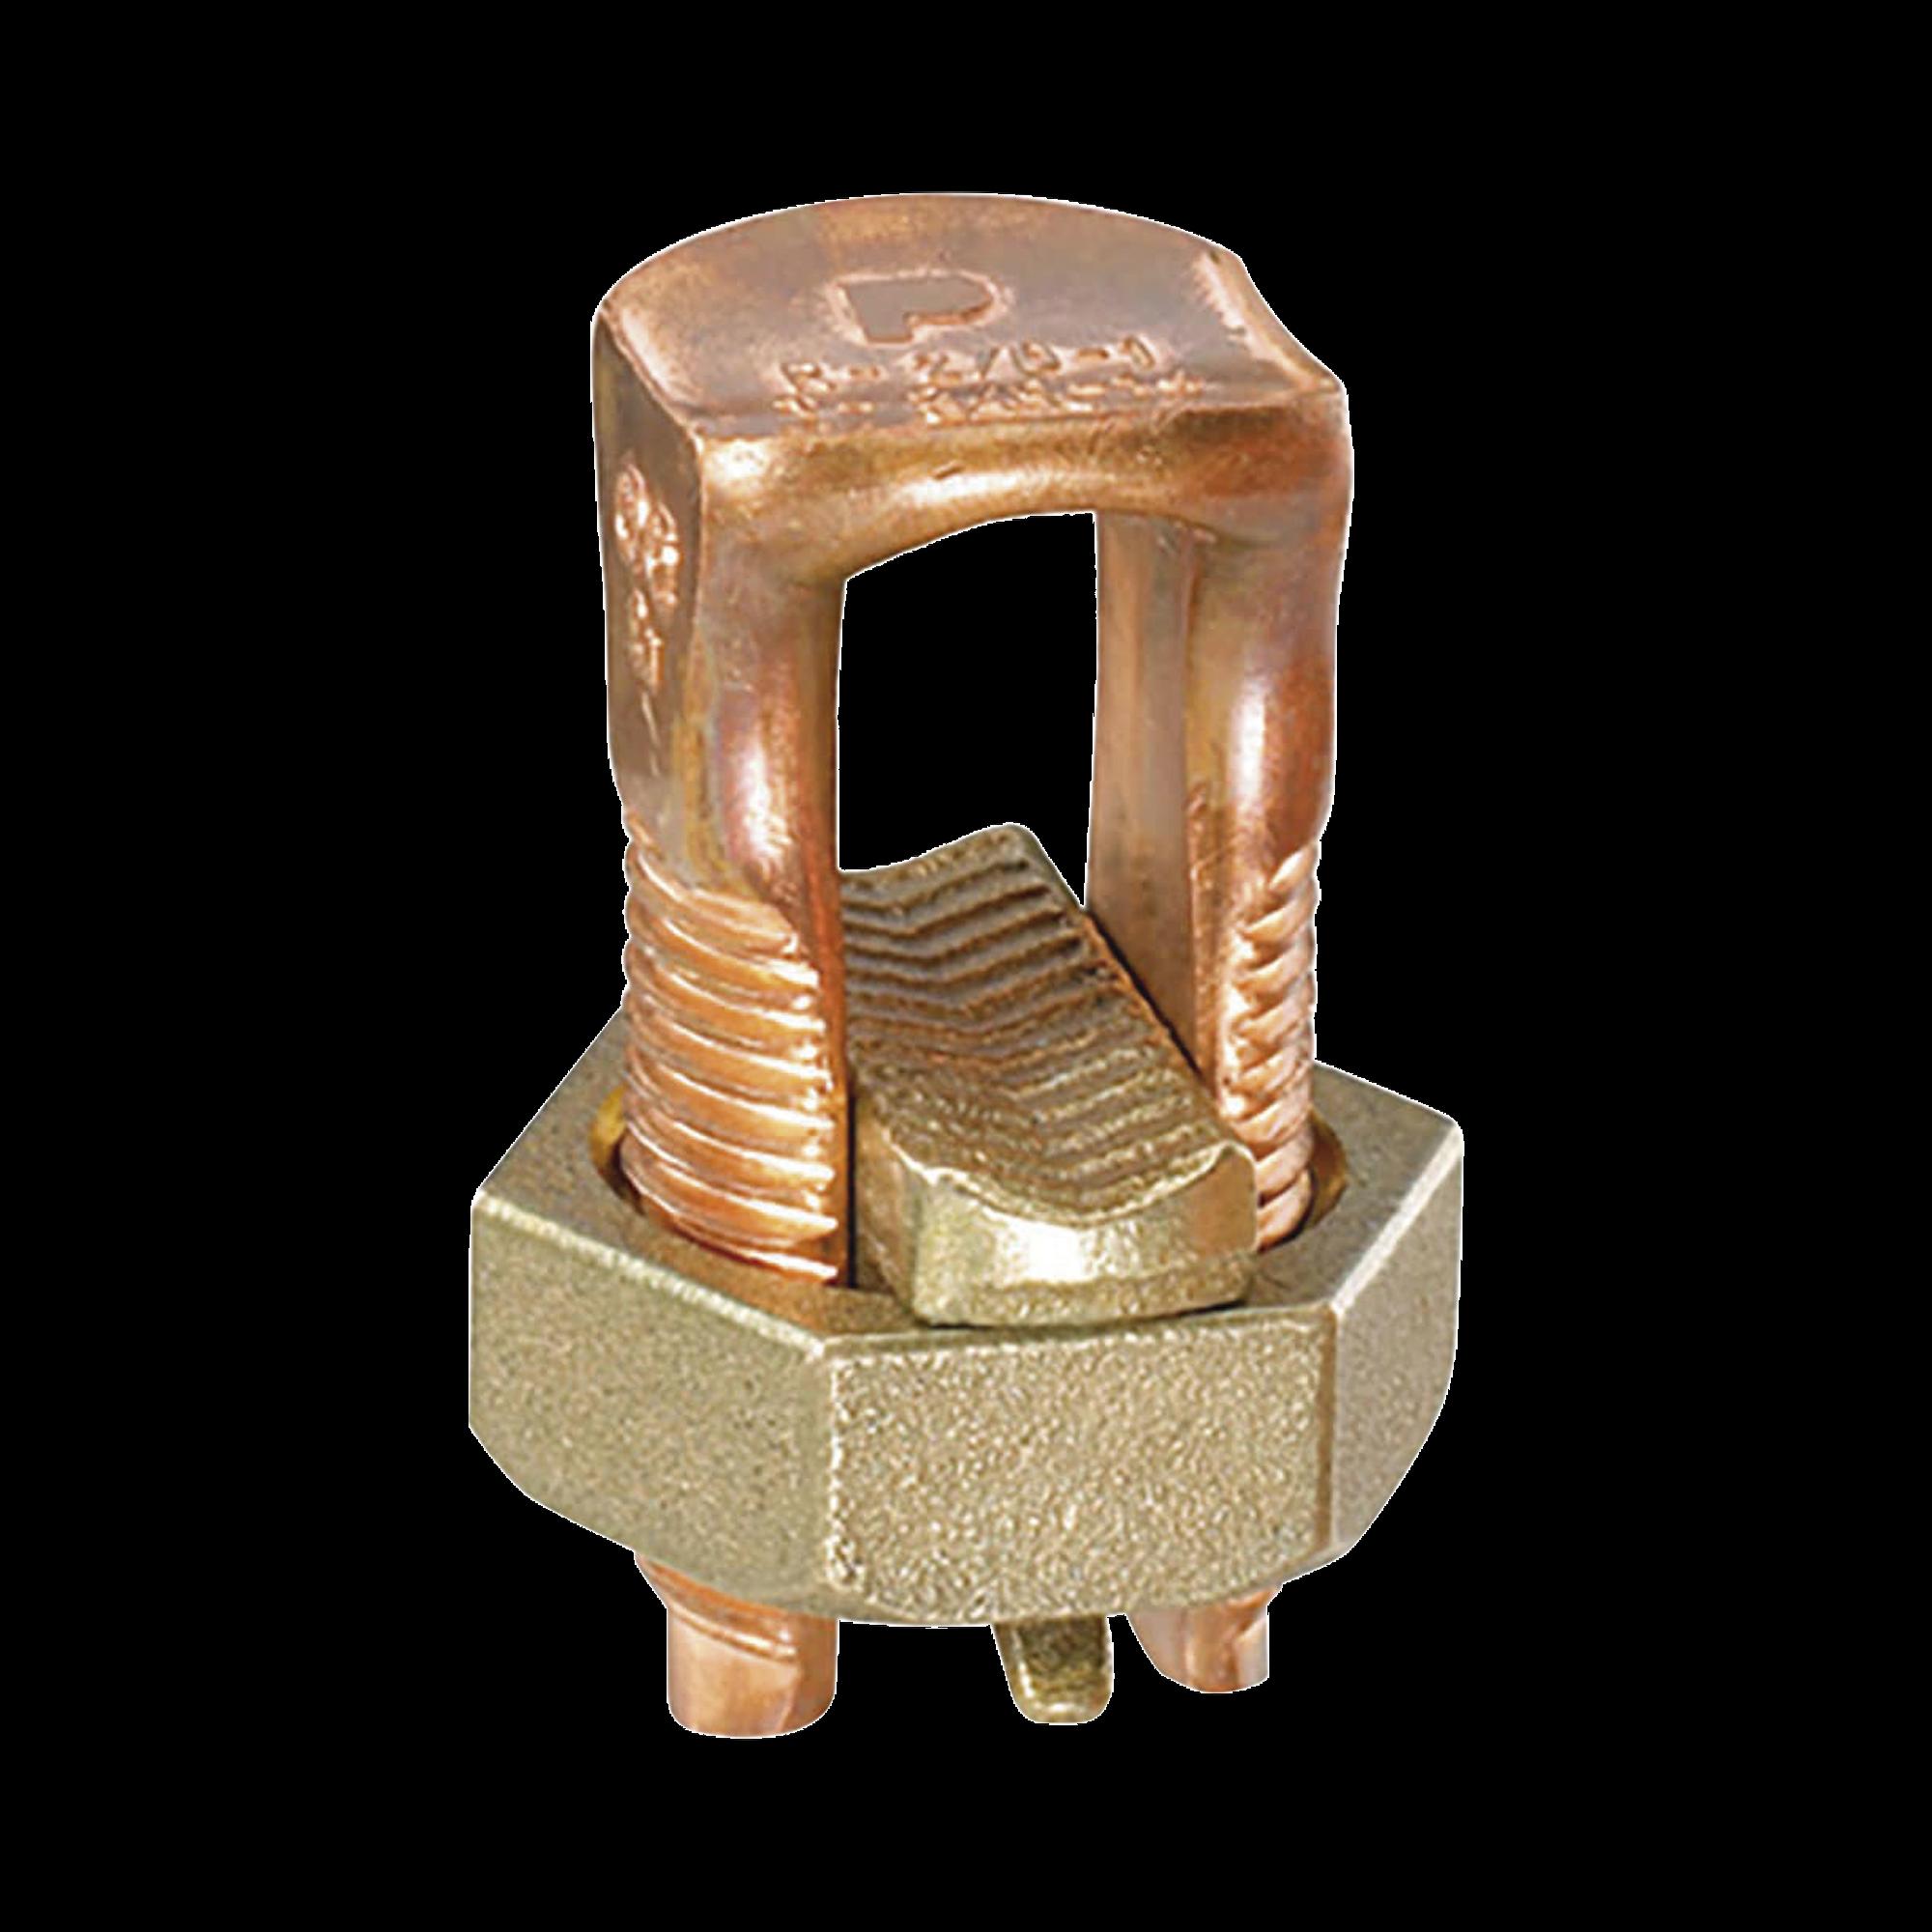 Conector Mecánico de Puesta a Tierra, de Cobre, Para Cables de Calibre 8 a 4 AWG